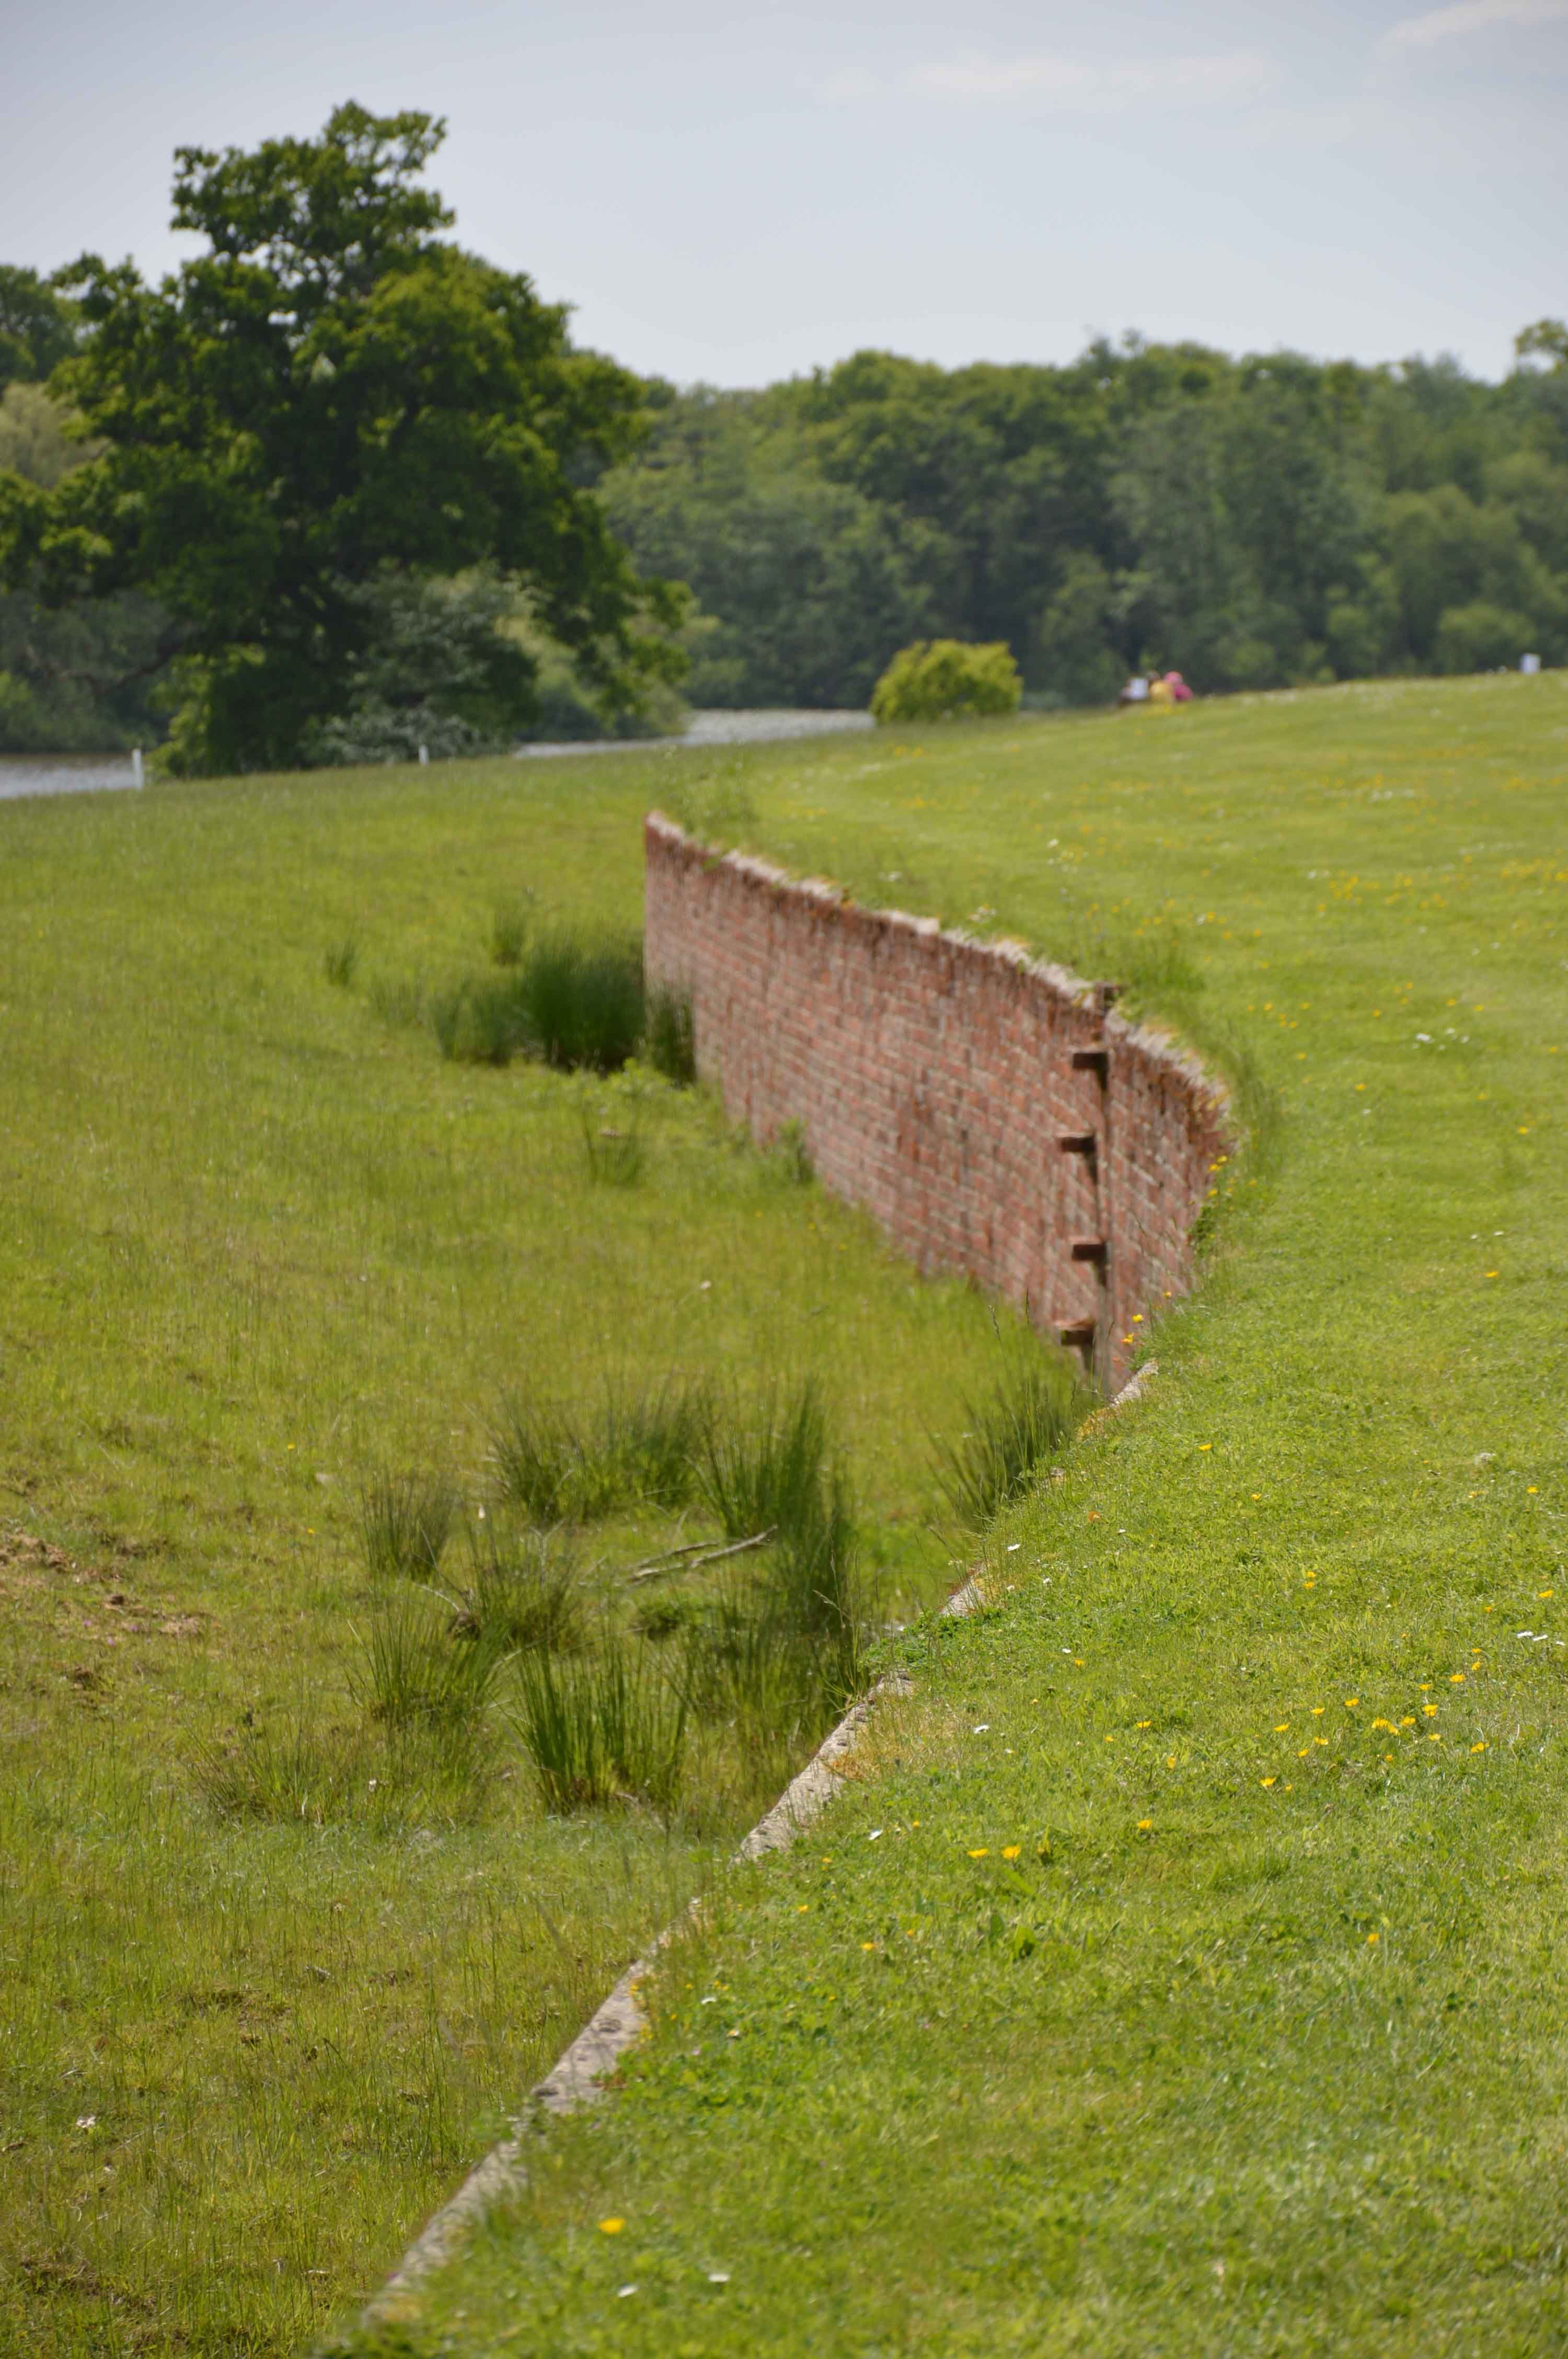 Resultado de imagen para haha garden | Walls and Fences | Pinterest ...